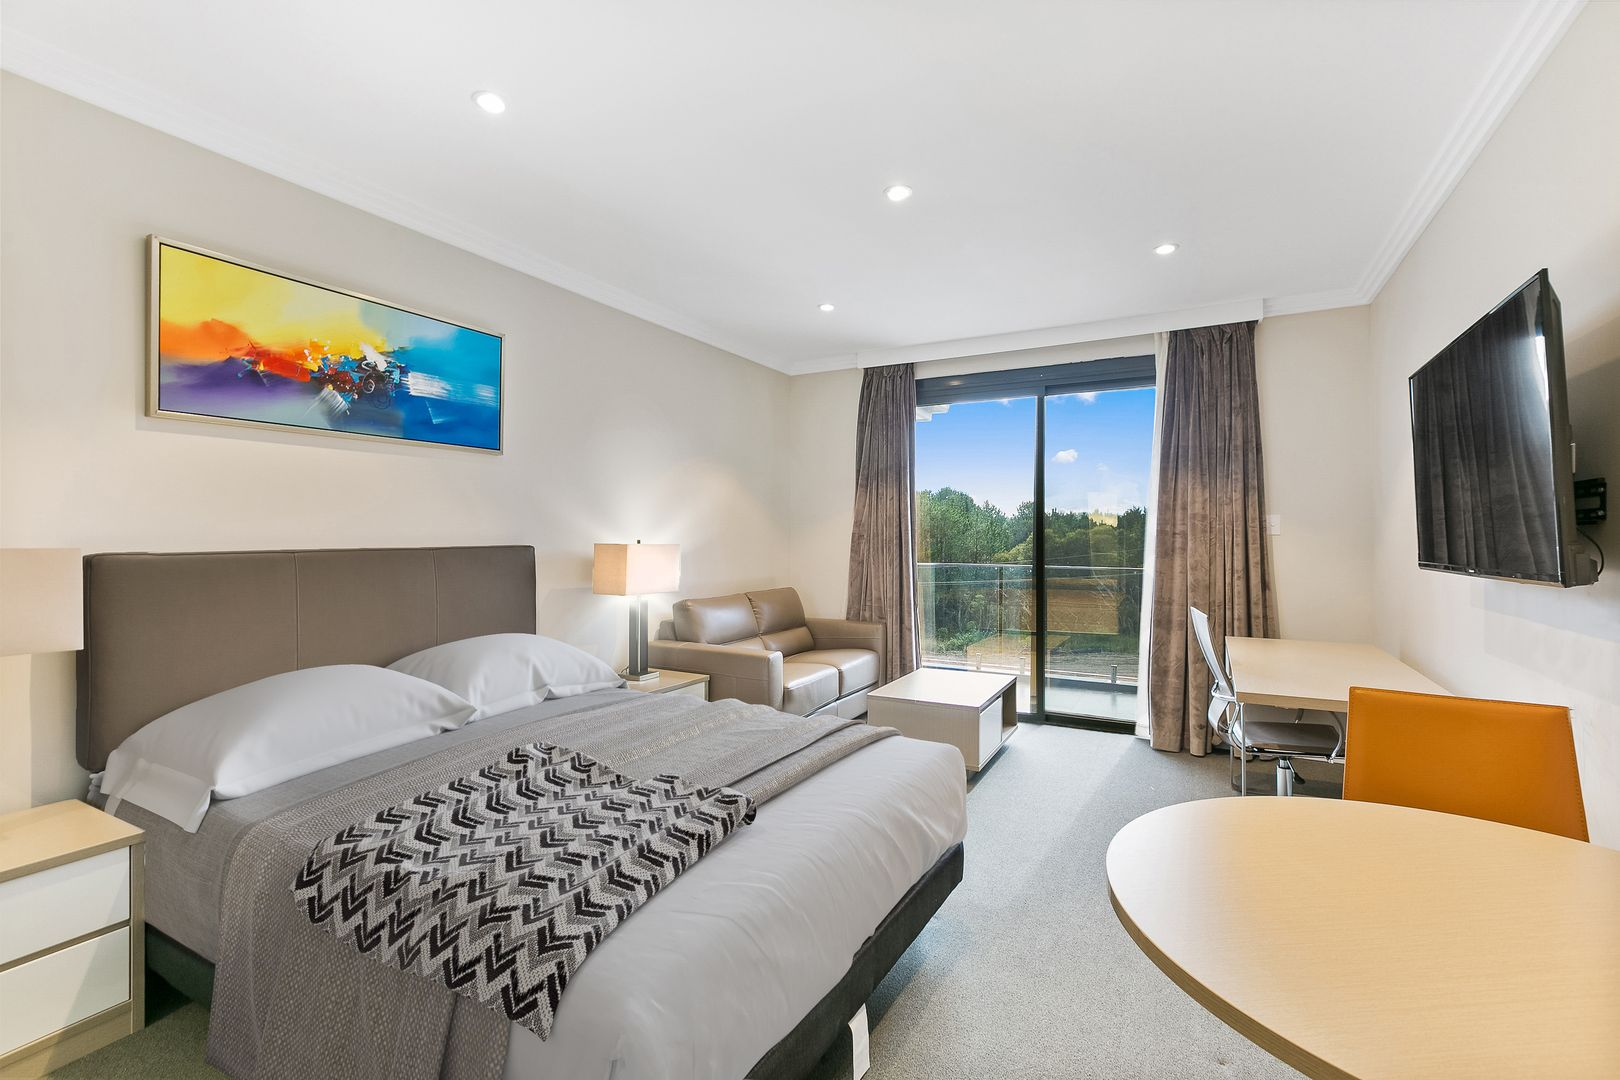 16/2506 Bundaleer Street, Belrose NSW 2085, Image 0